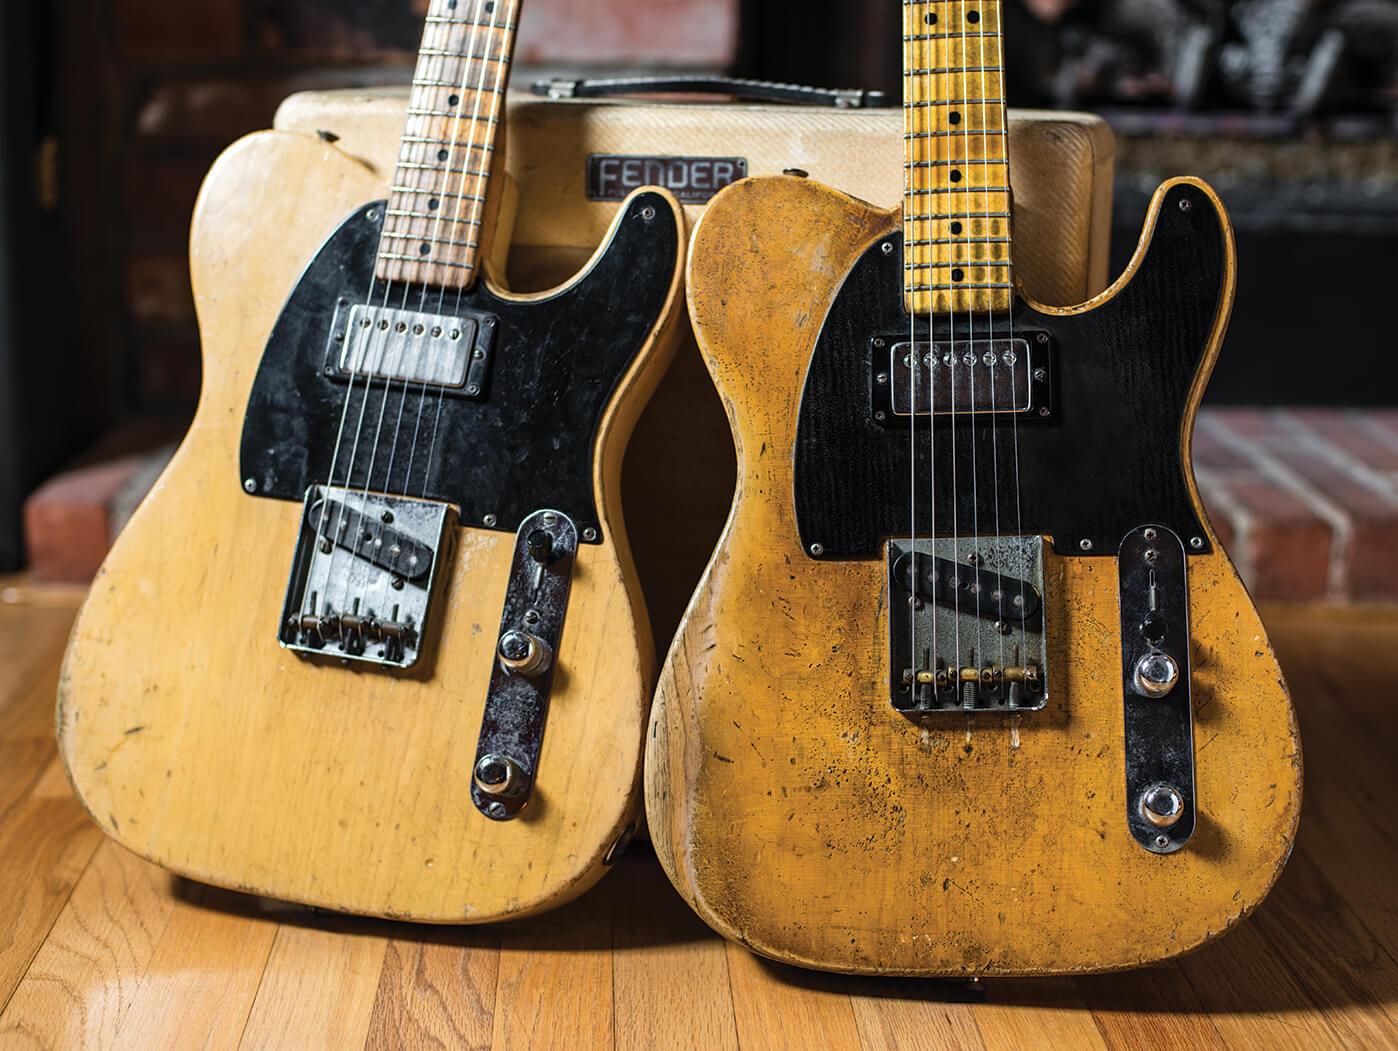 rare guitars joe bonamassa 39 s 1951 nocaster and 1952 telecaster. Black Bedroom Furniture Sets. Home Design Ideas